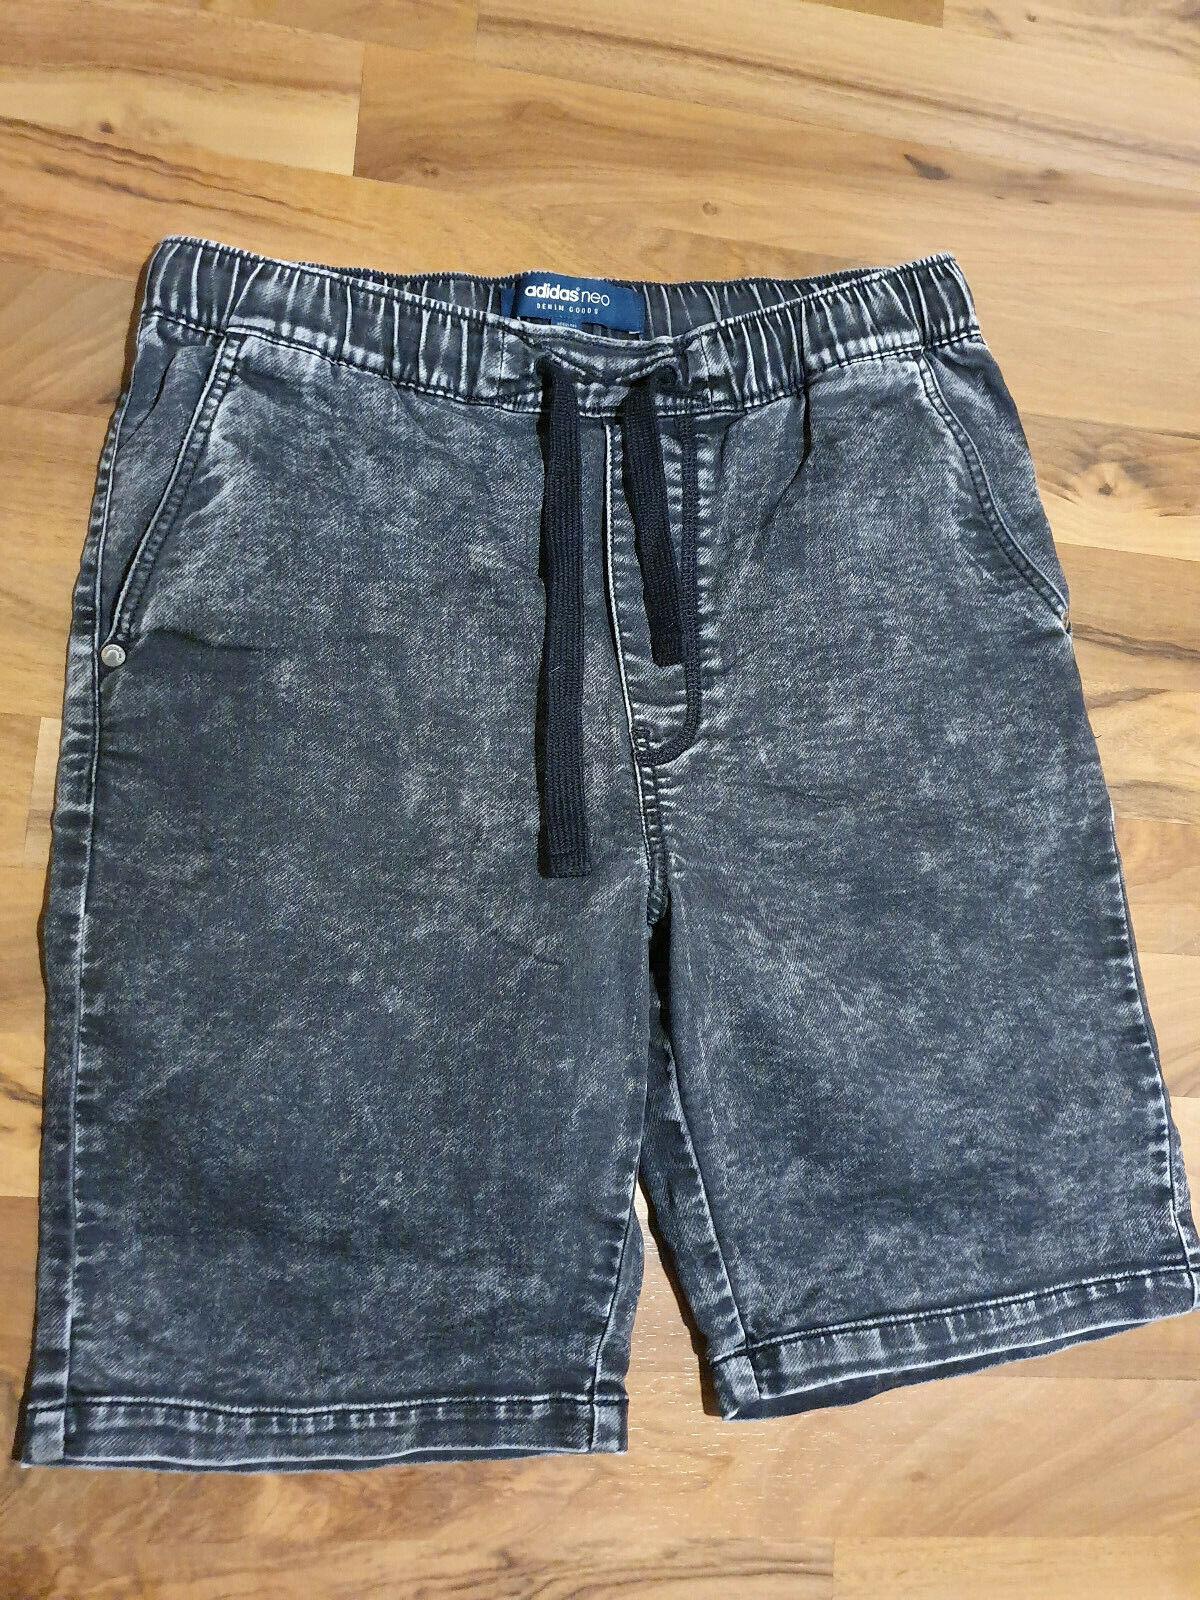 Adidas Kurze Hose Jeans Test Vergleich +++ Adidas Kurze Hose